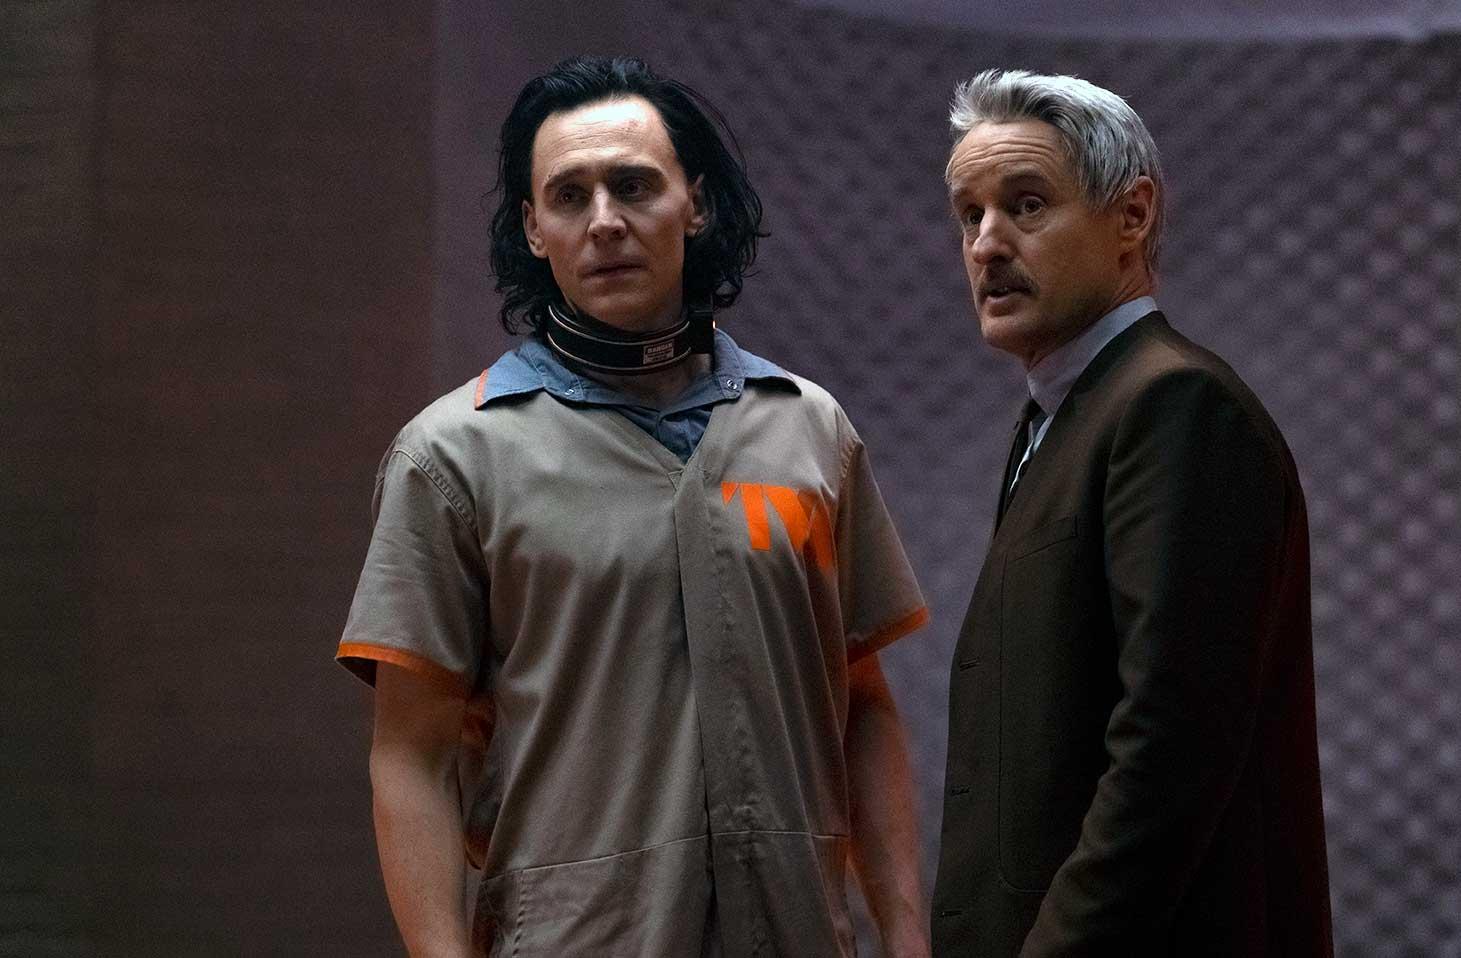 Loki's time has come in new Disney+ trailer